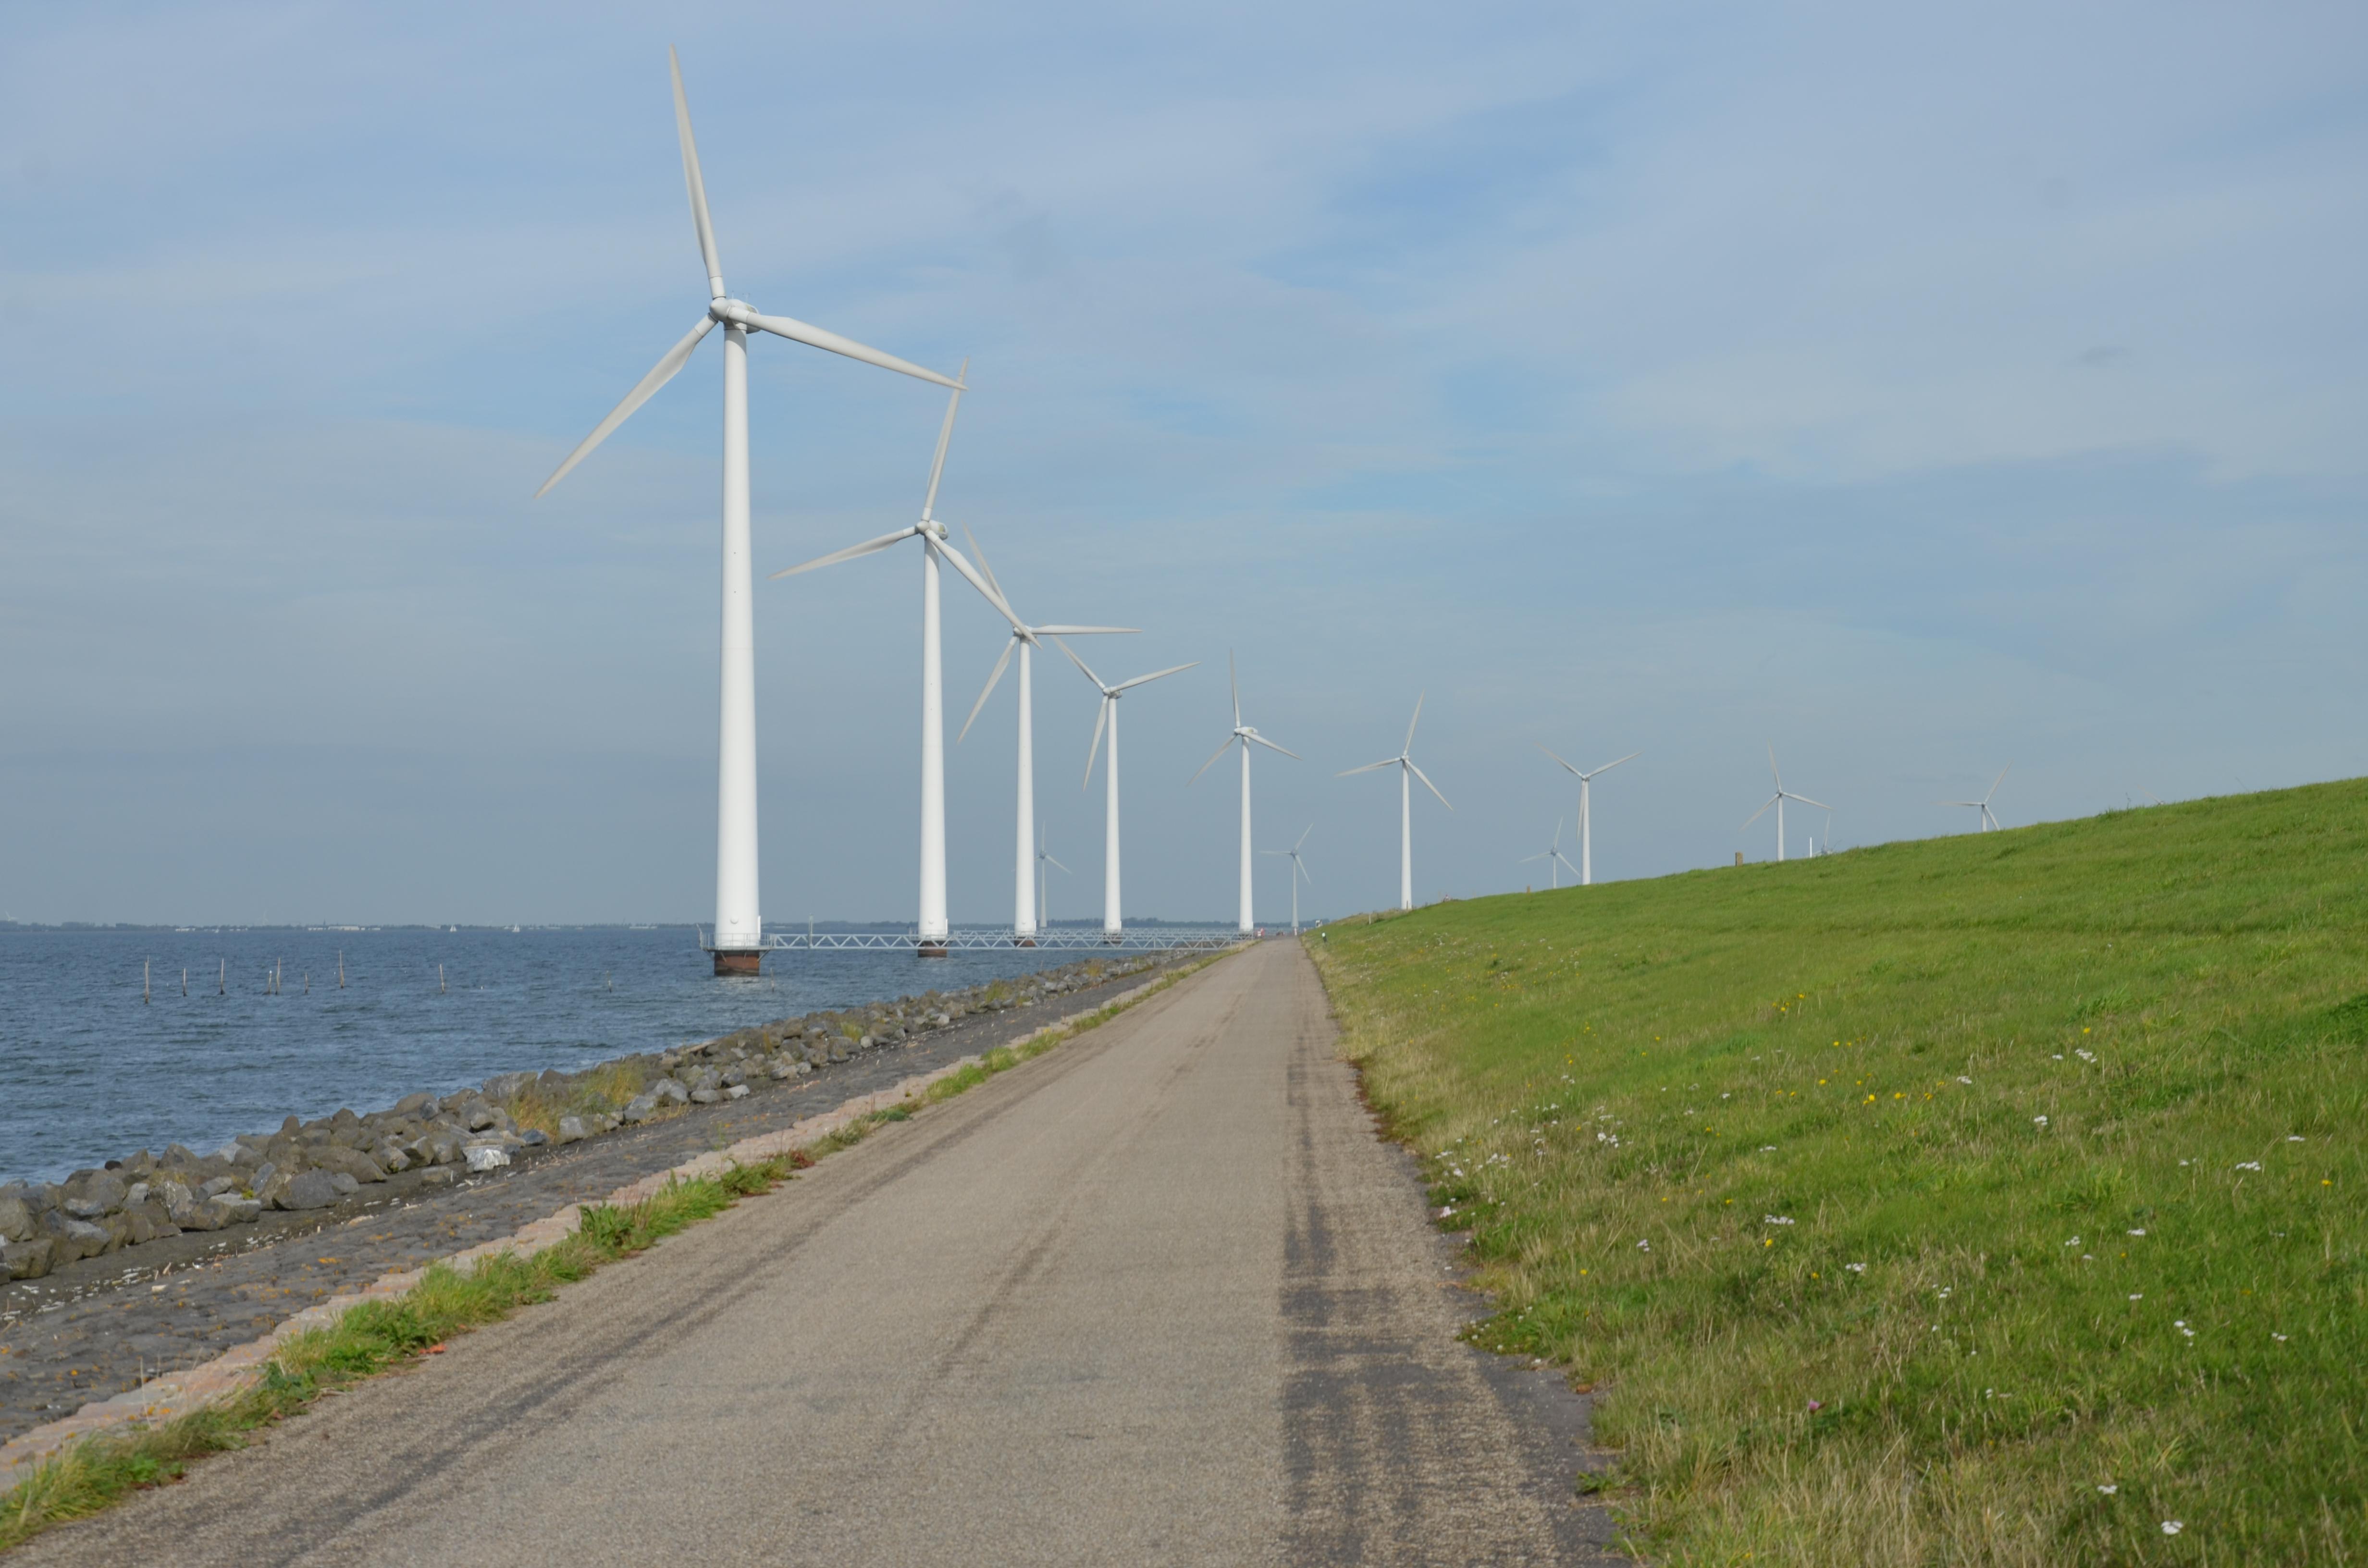 File:Wind park A6 Flevoland 1.jpg